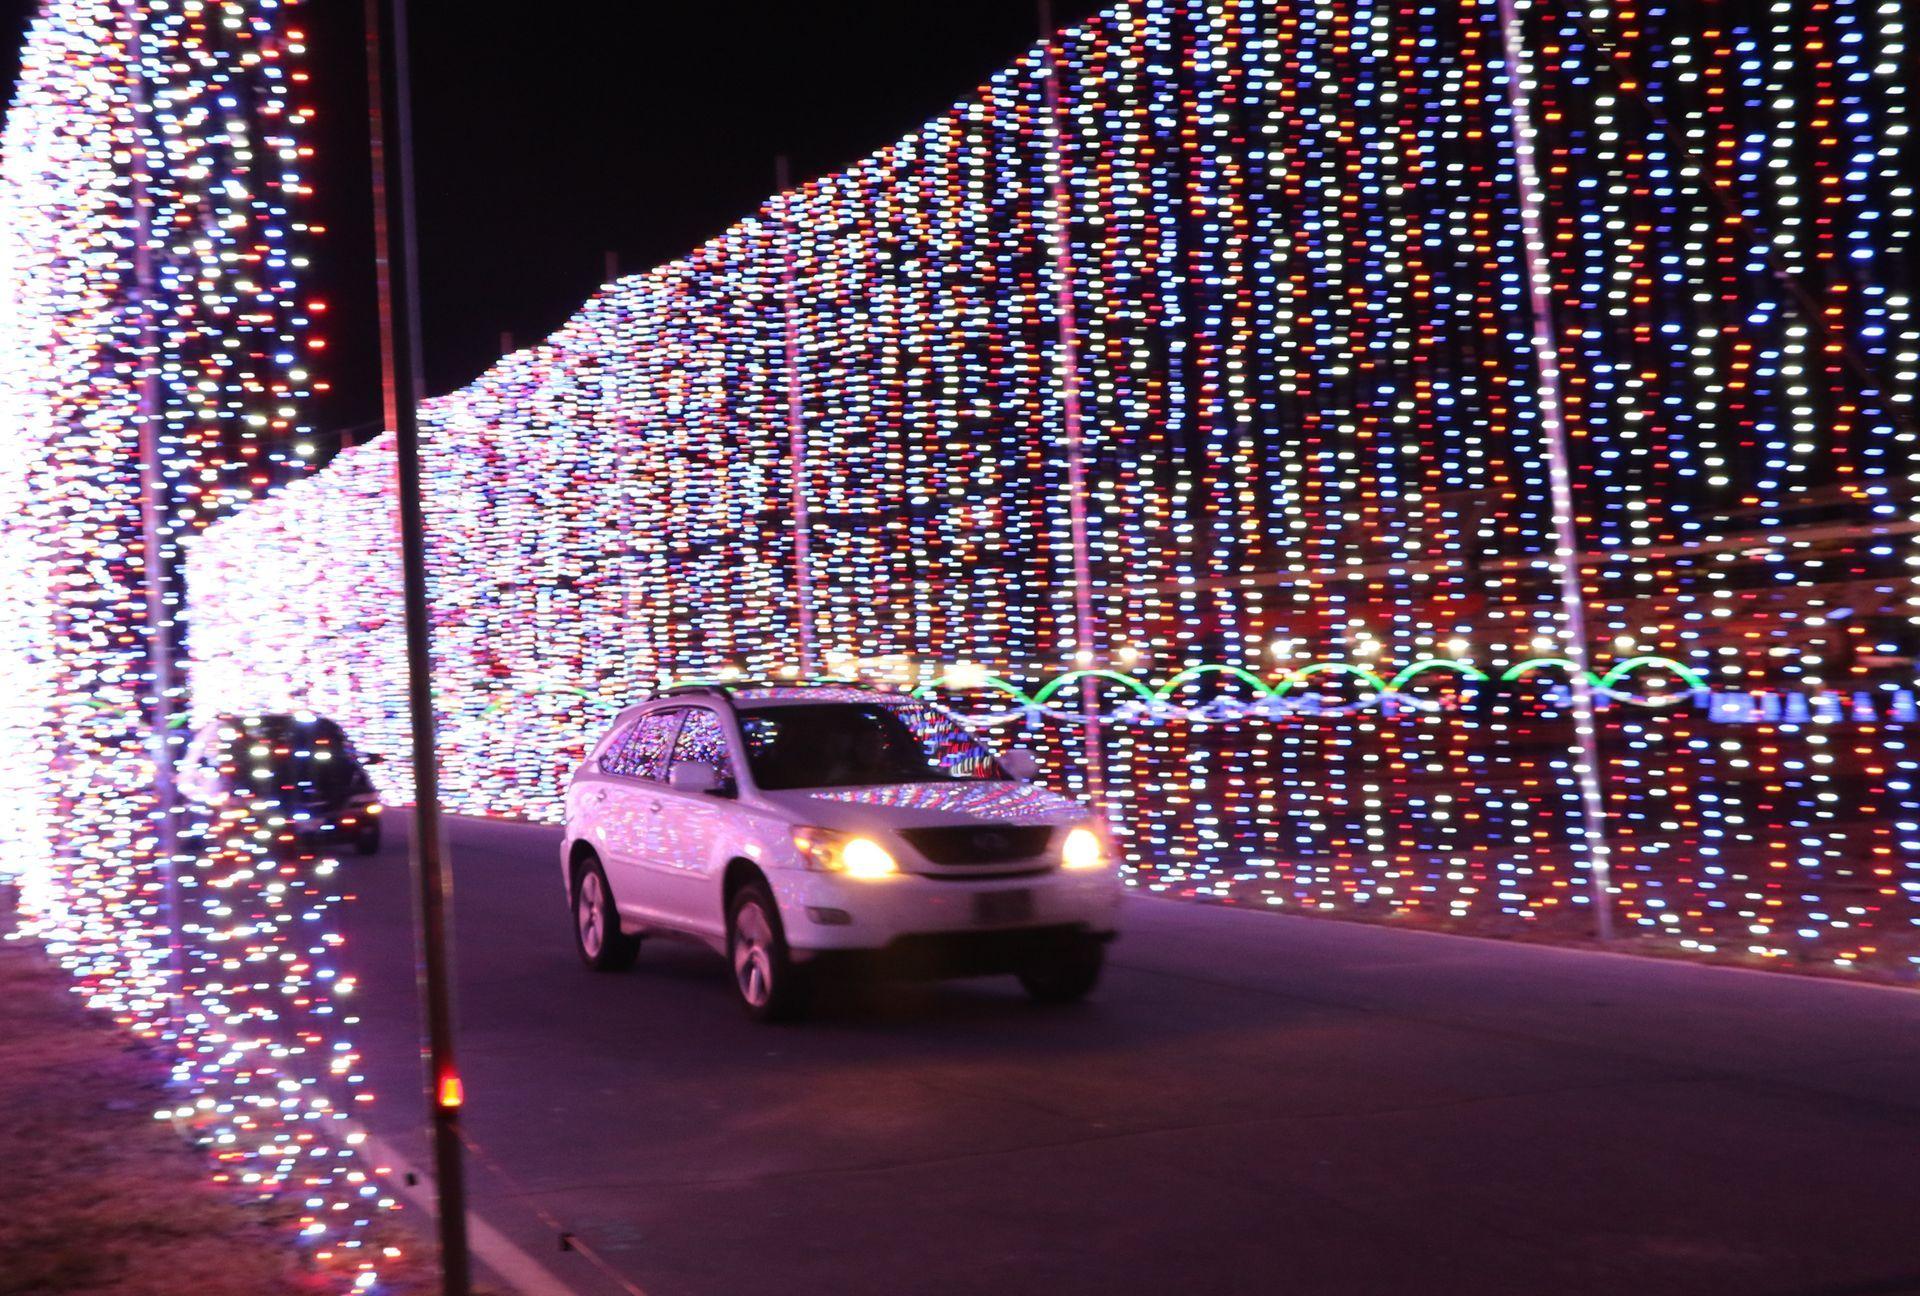 speedway christmas lights up charlotte motor speedway back to photos archive - Charlotte Motor Speedway Christmas Lights 2014